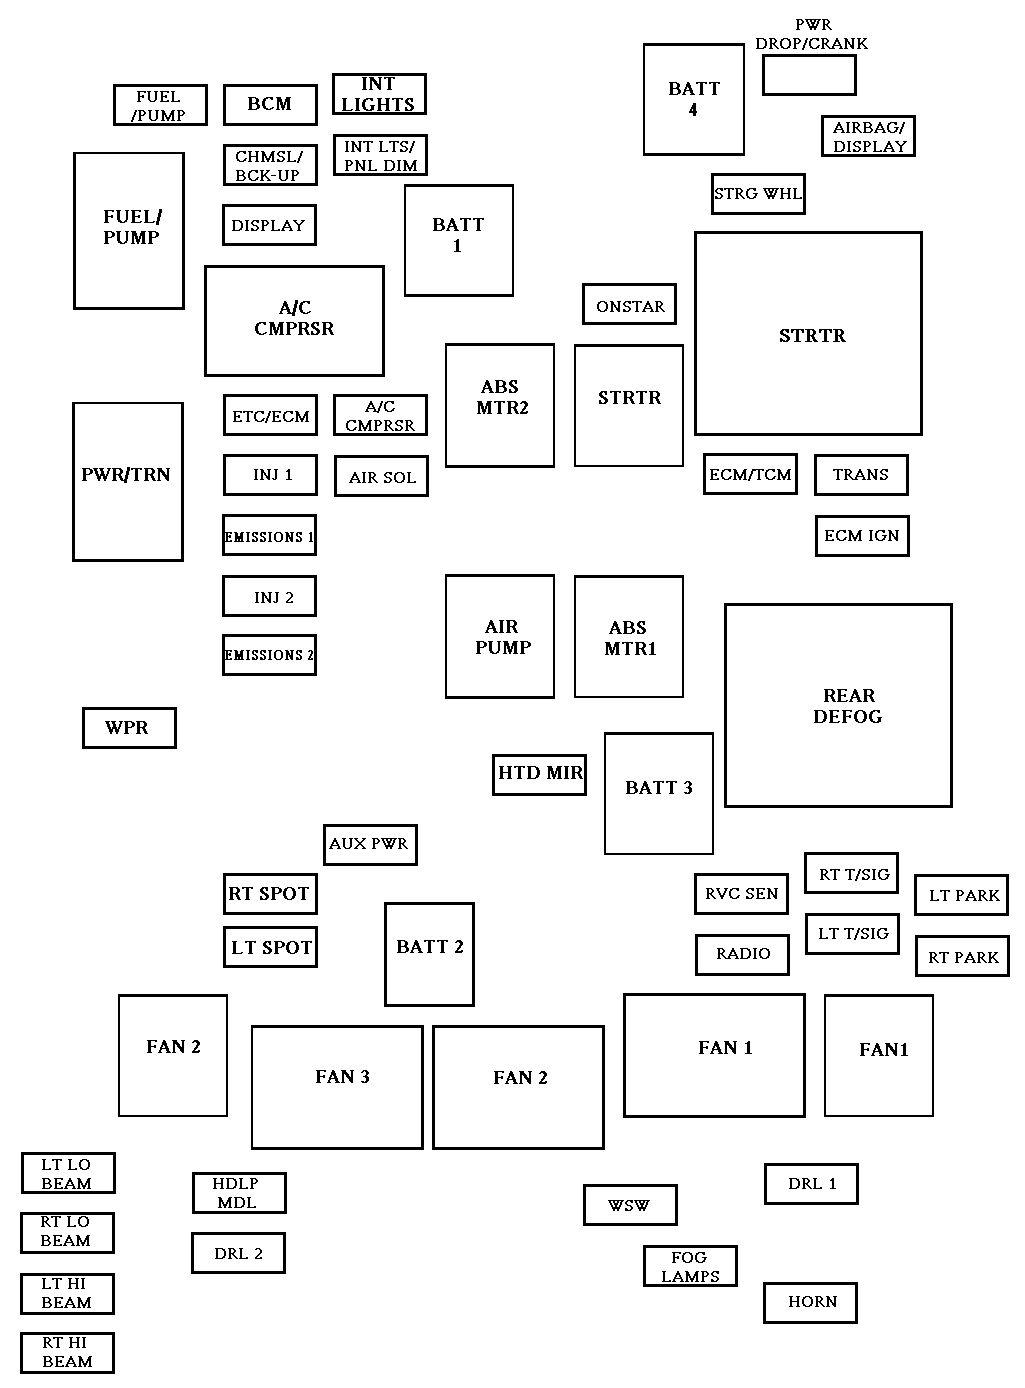 06 impala fuse box wiring diagram save 06 Impala Airbag Wiring Diagram